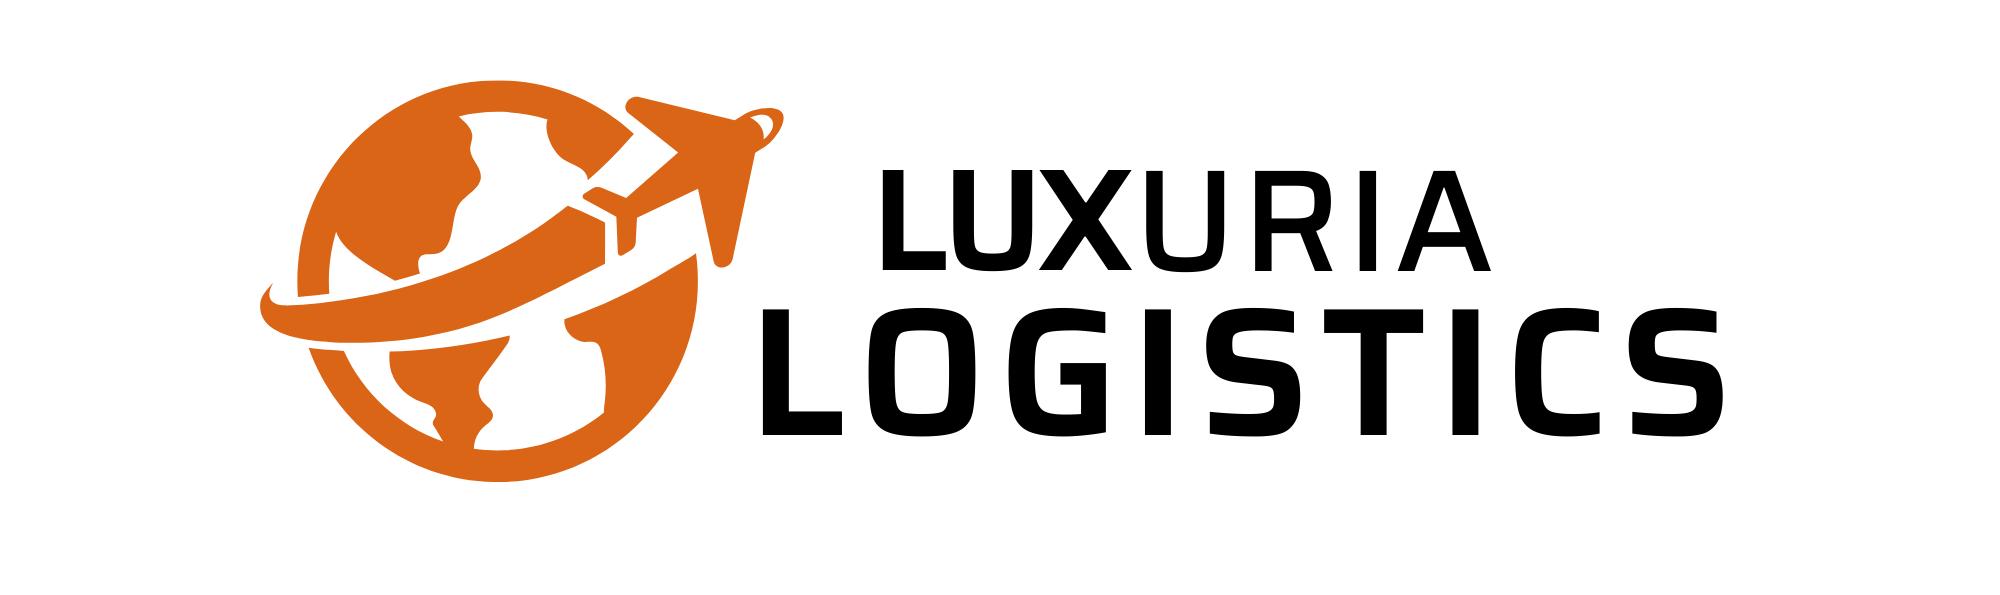 Luxuria Logistics